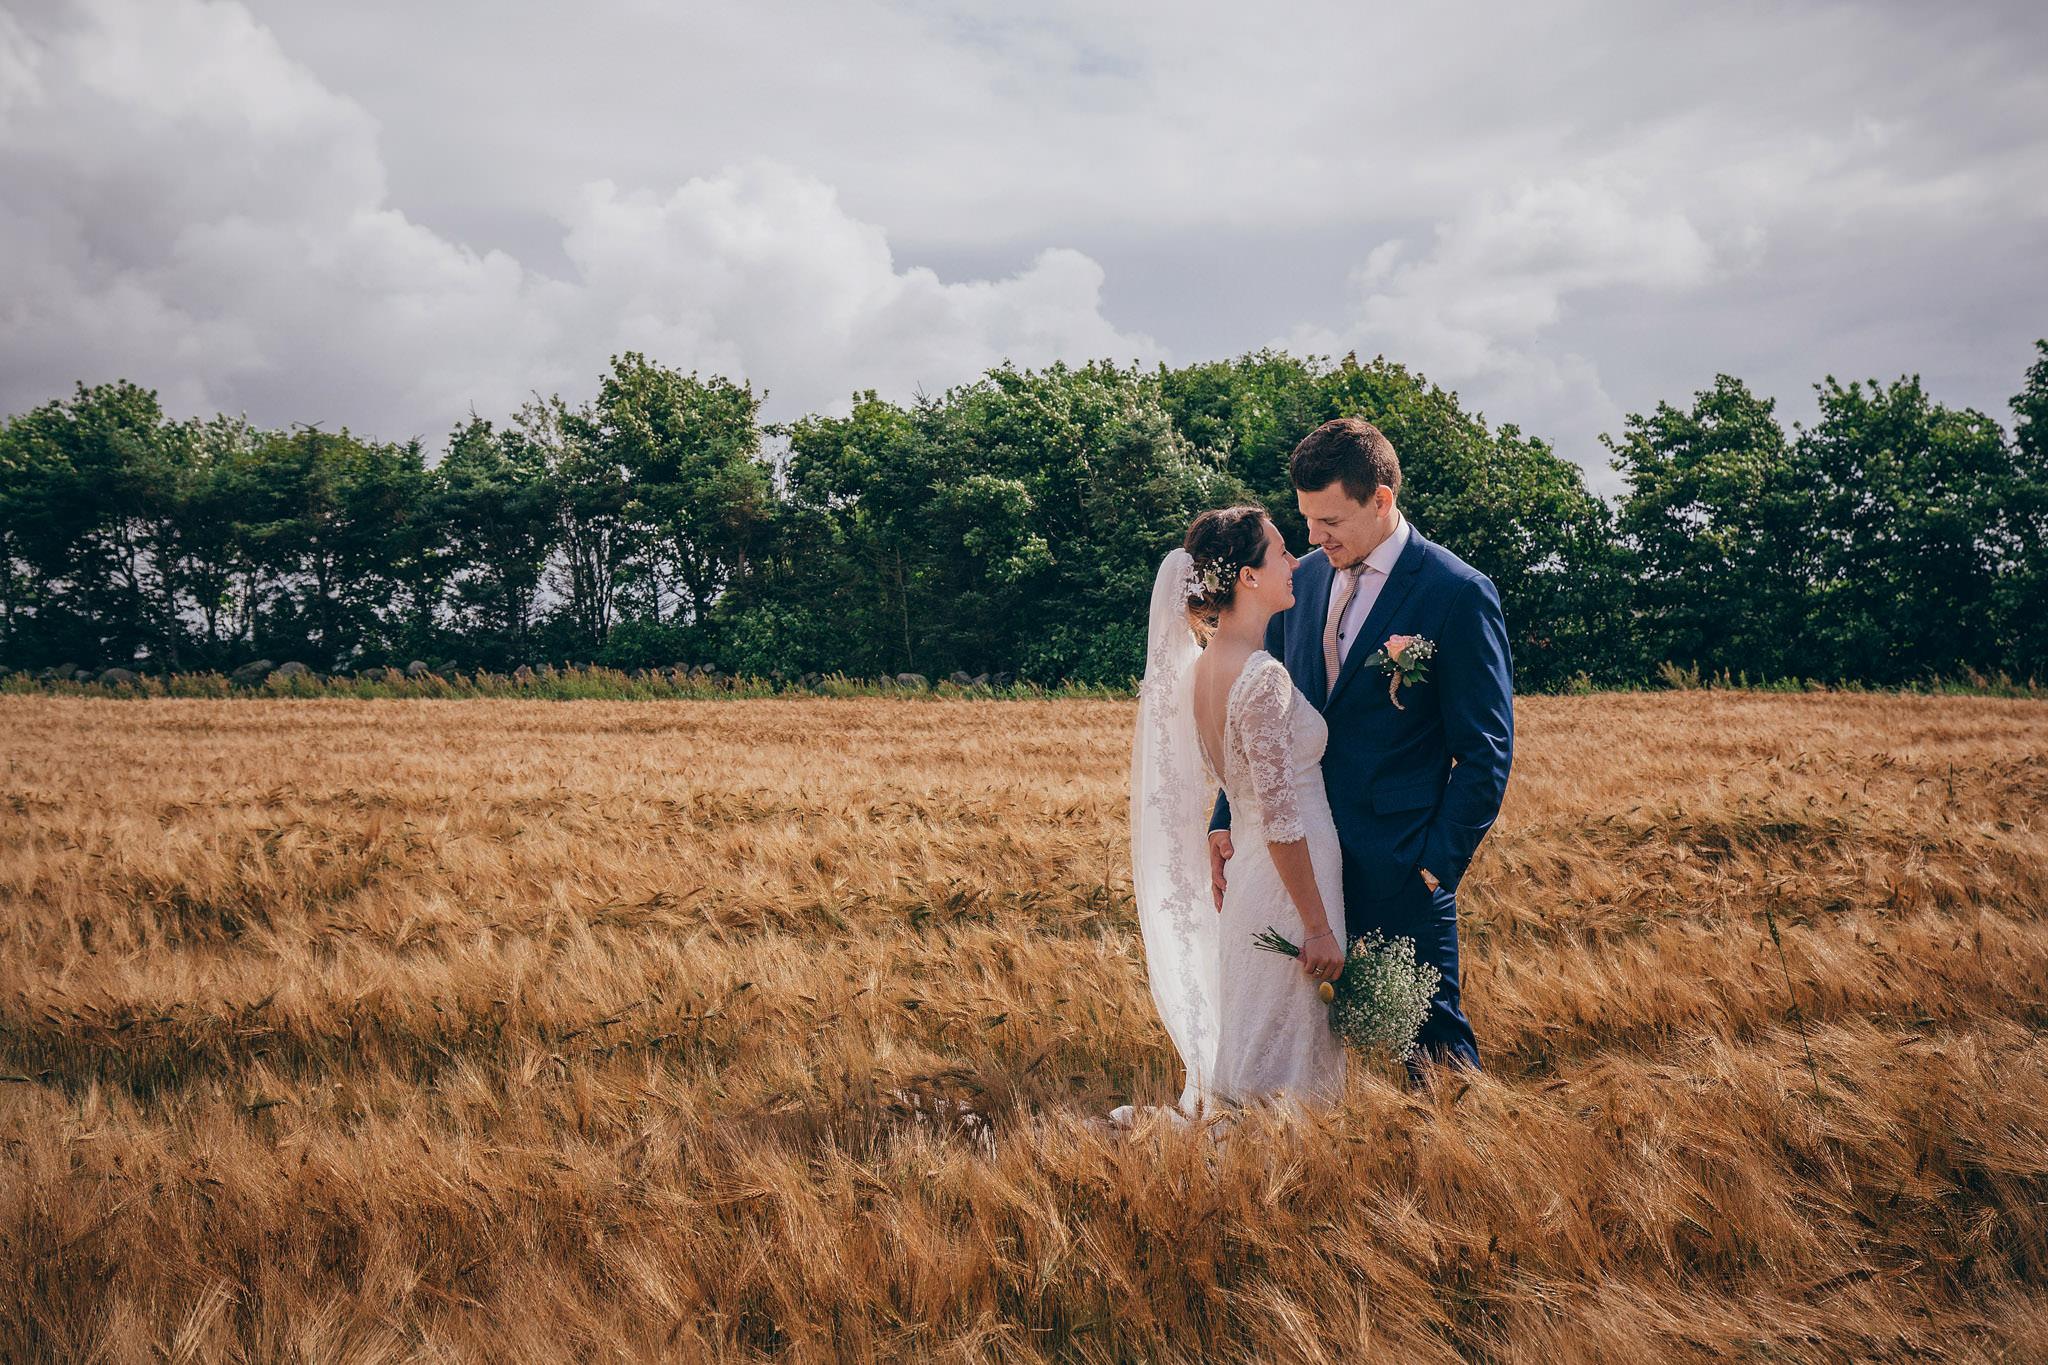 Norway+wedding+photographer+elopement+pre+wedding+Casey+Arneson-83.jpg